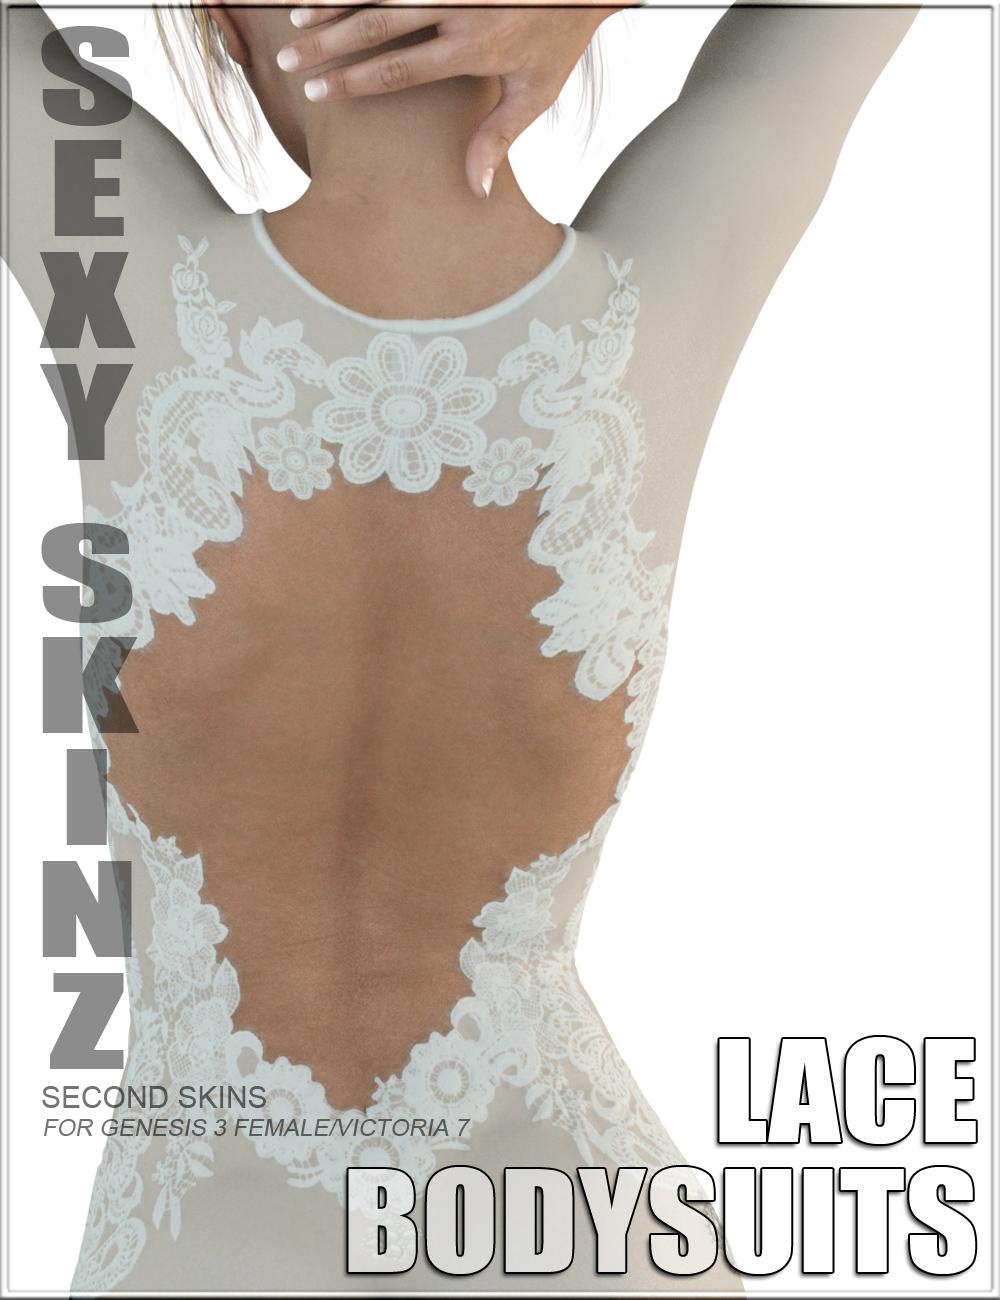 Sexy Skinz - Lace Bodysuits for Genesis 3 Female(s) by: vyktohria, 3D Models by Daz 3D